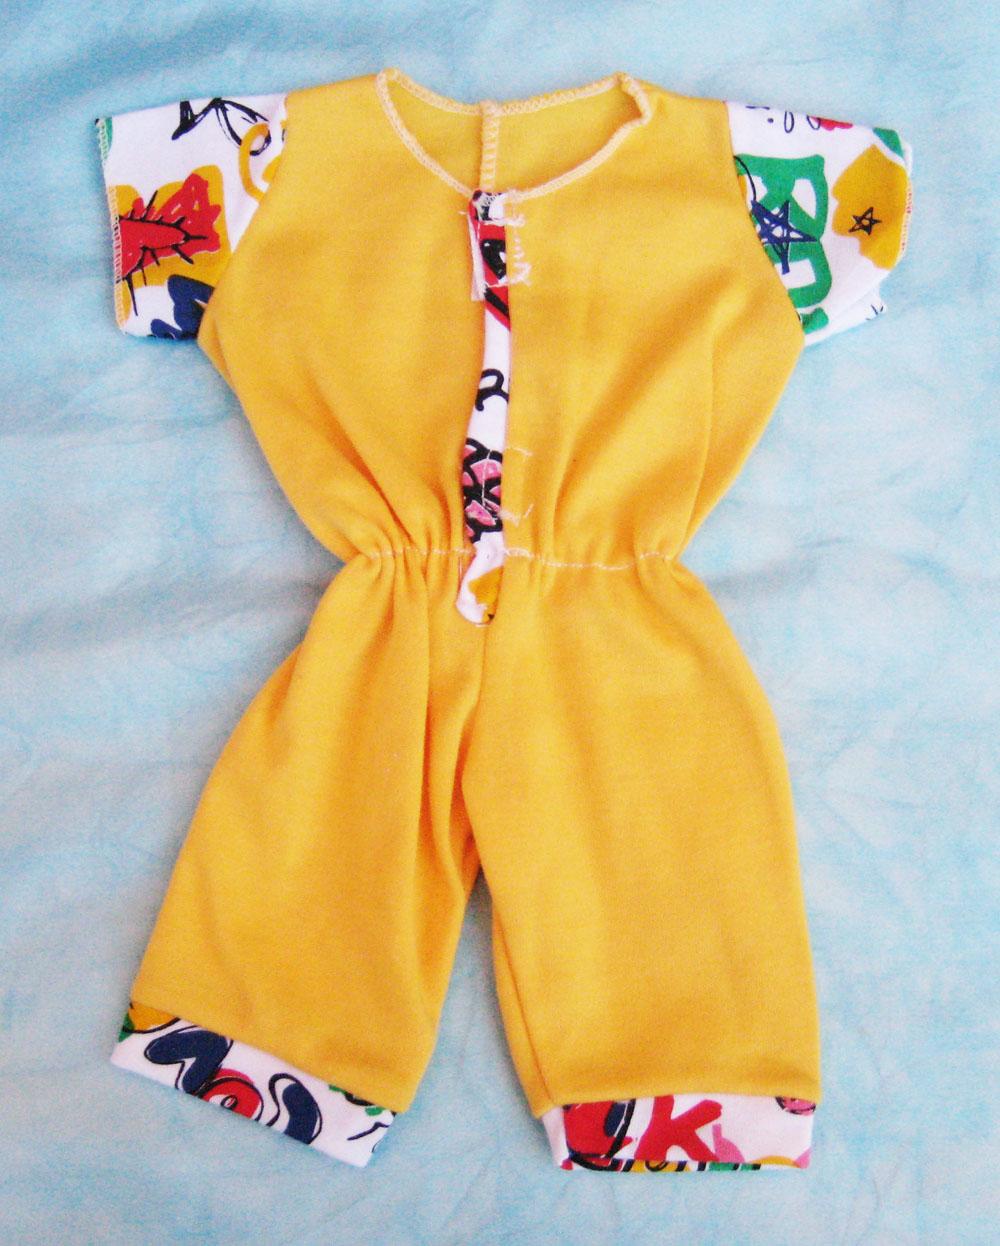 pijama-amarillo-para-muneco-waldorf